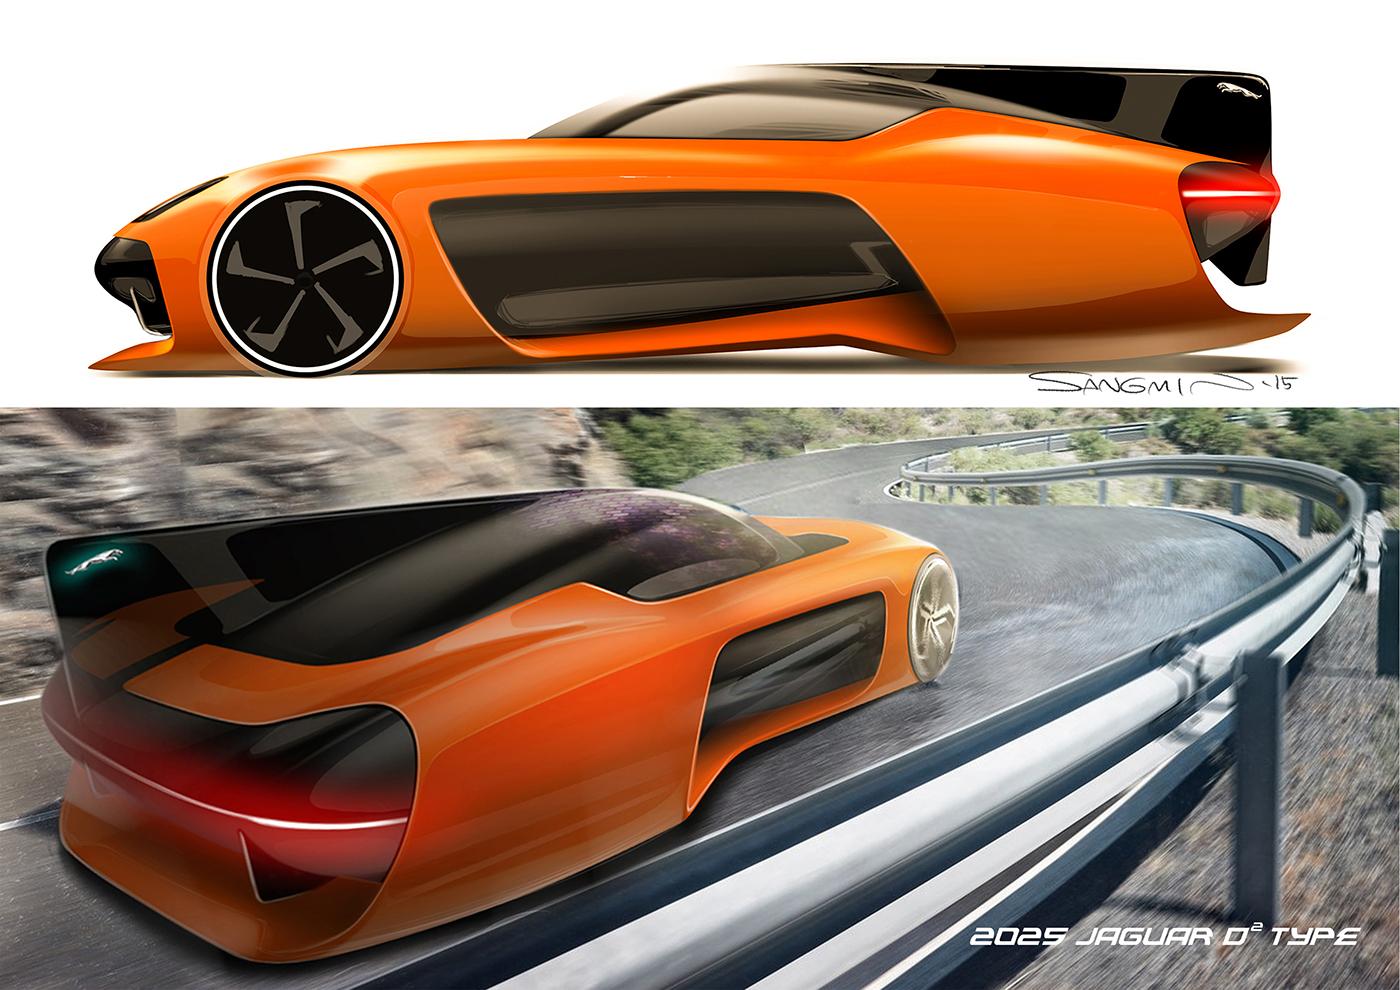 2025 Jaguar 2-seater sports car on Behance